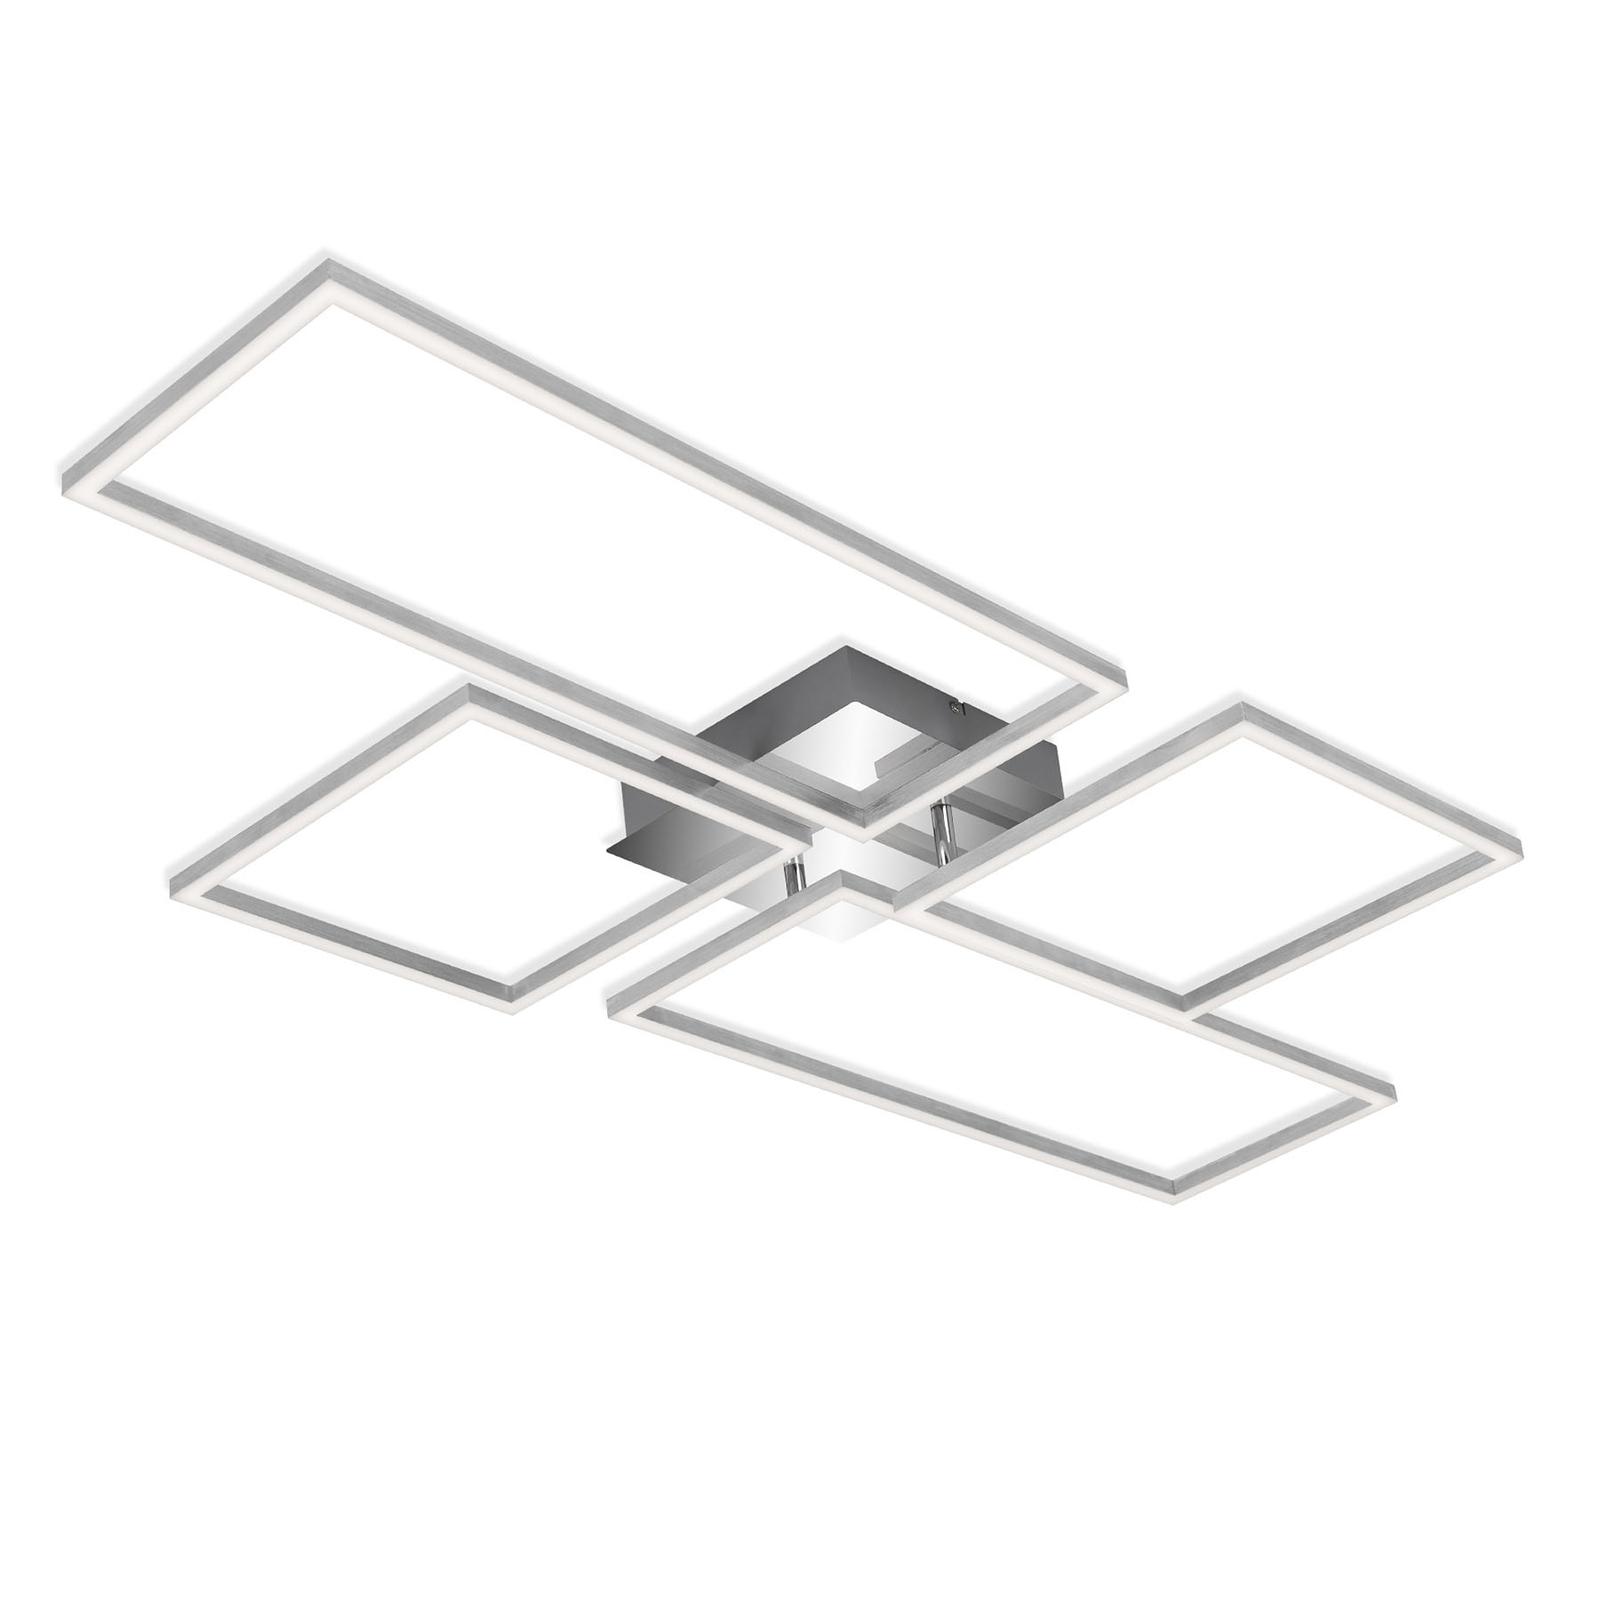 LED-Deckenlampe Frame CCT, chrom-alu, 110x54cm